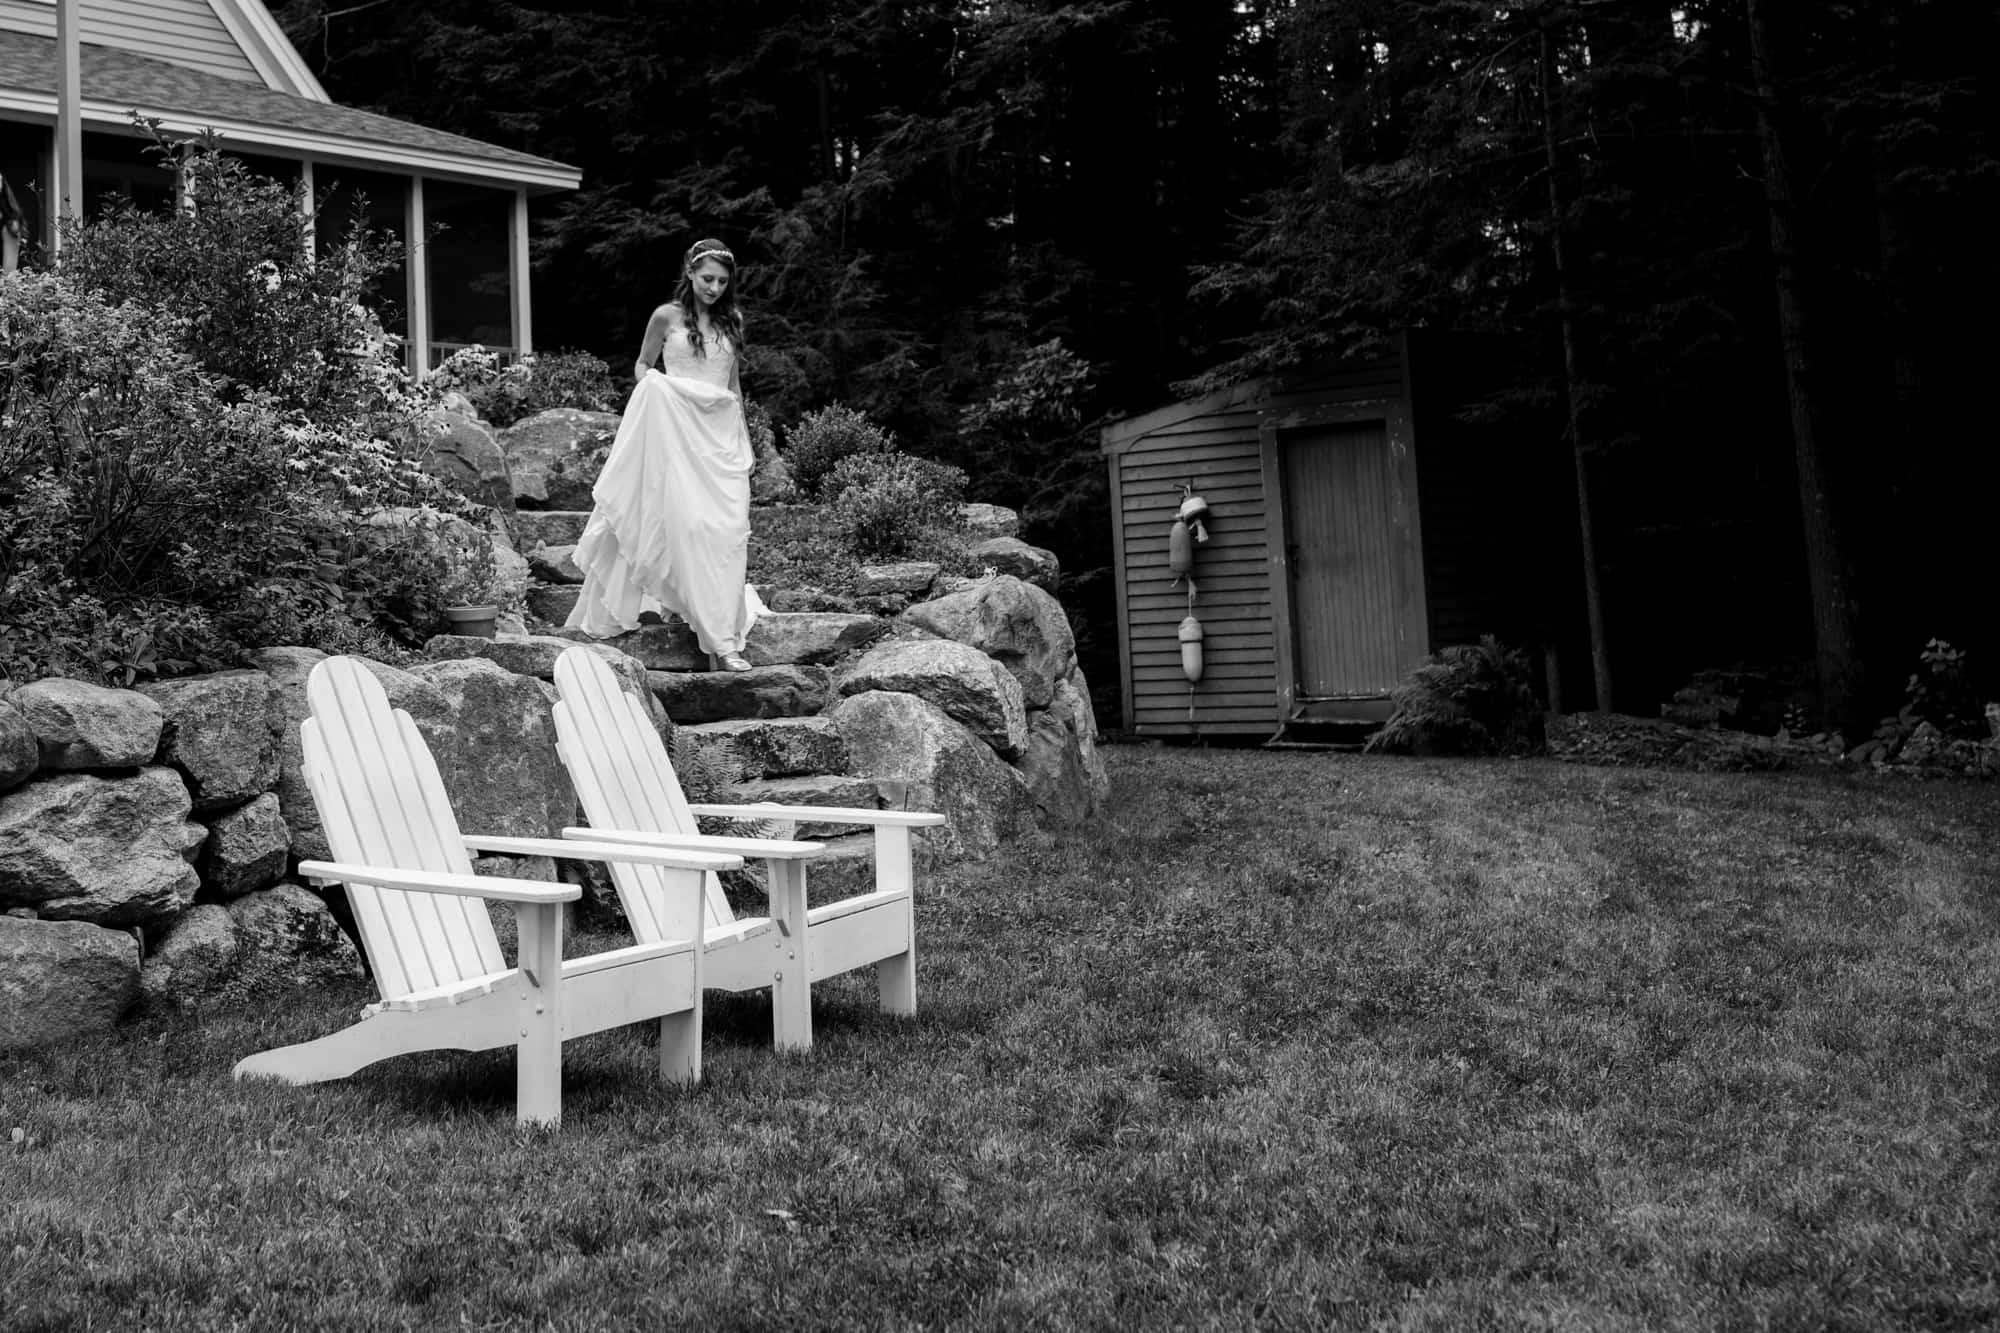 lake_sunapee_nh_wedding_04.jpg_1.jpg